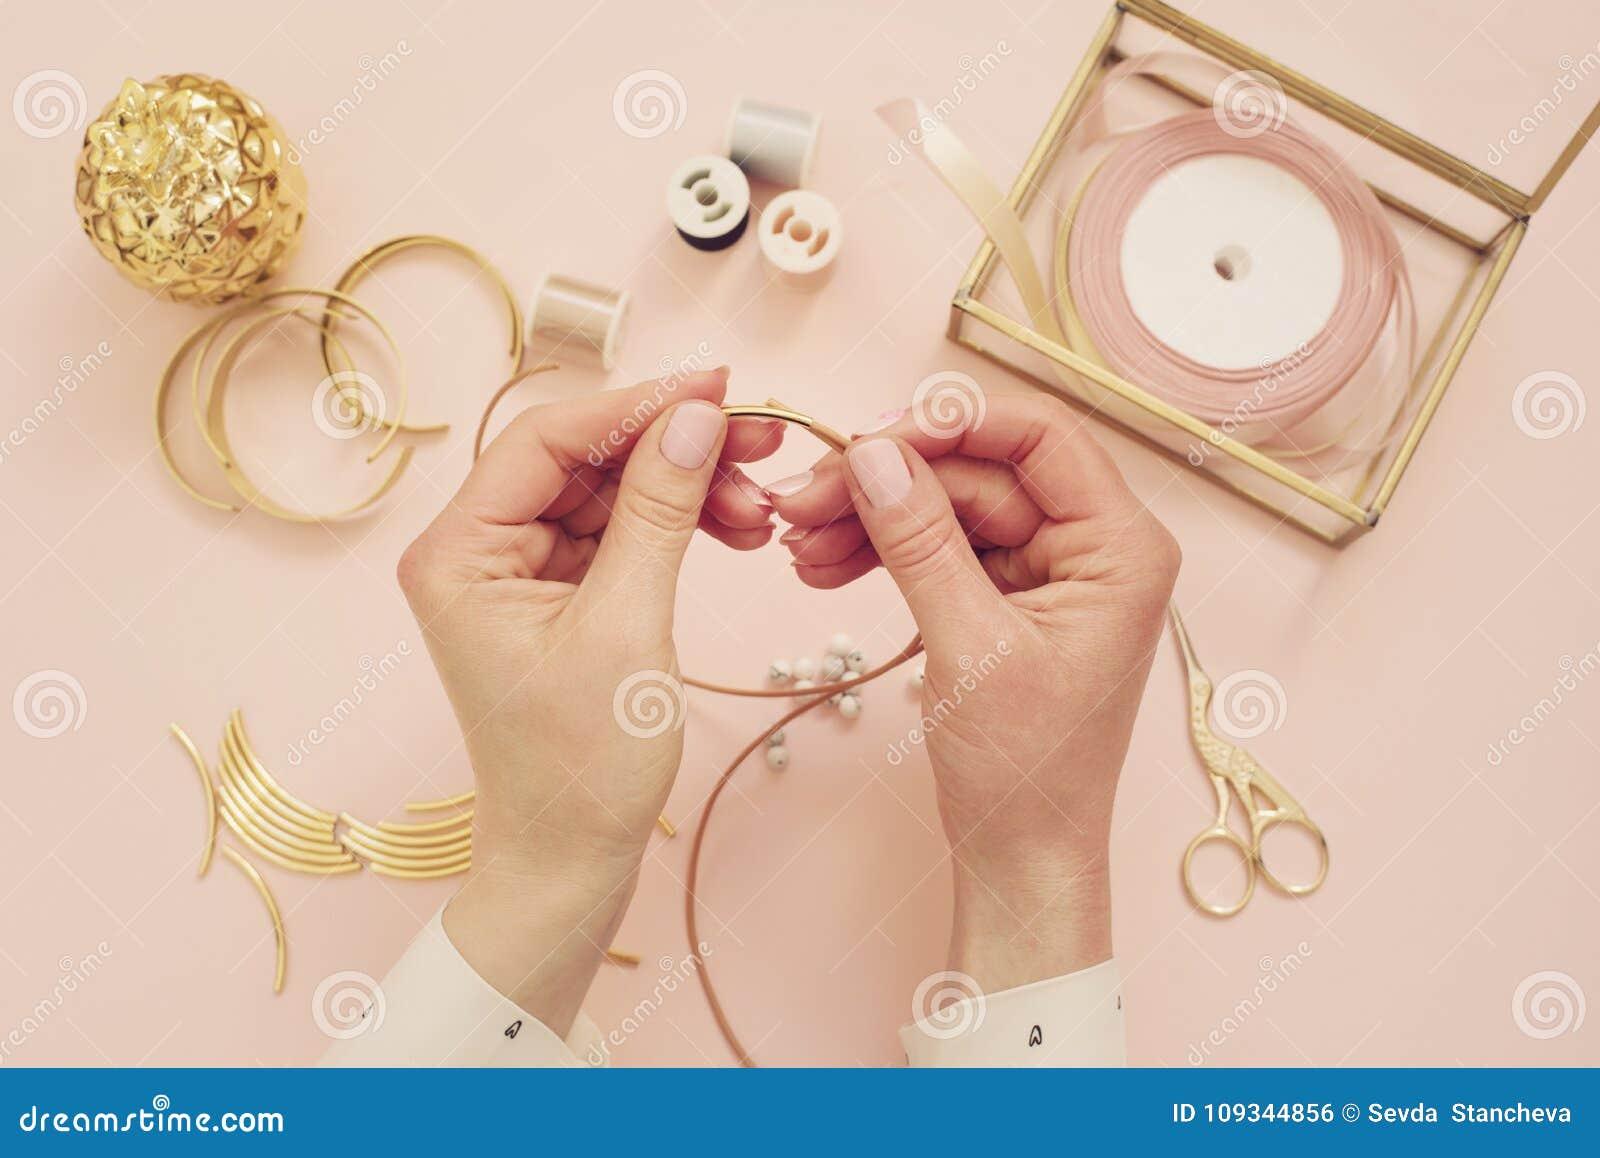 Jewelry designer workplace. Woman hands making handmade jewelry. Freelance fashion femininity workspace in flat lay style. Pastel